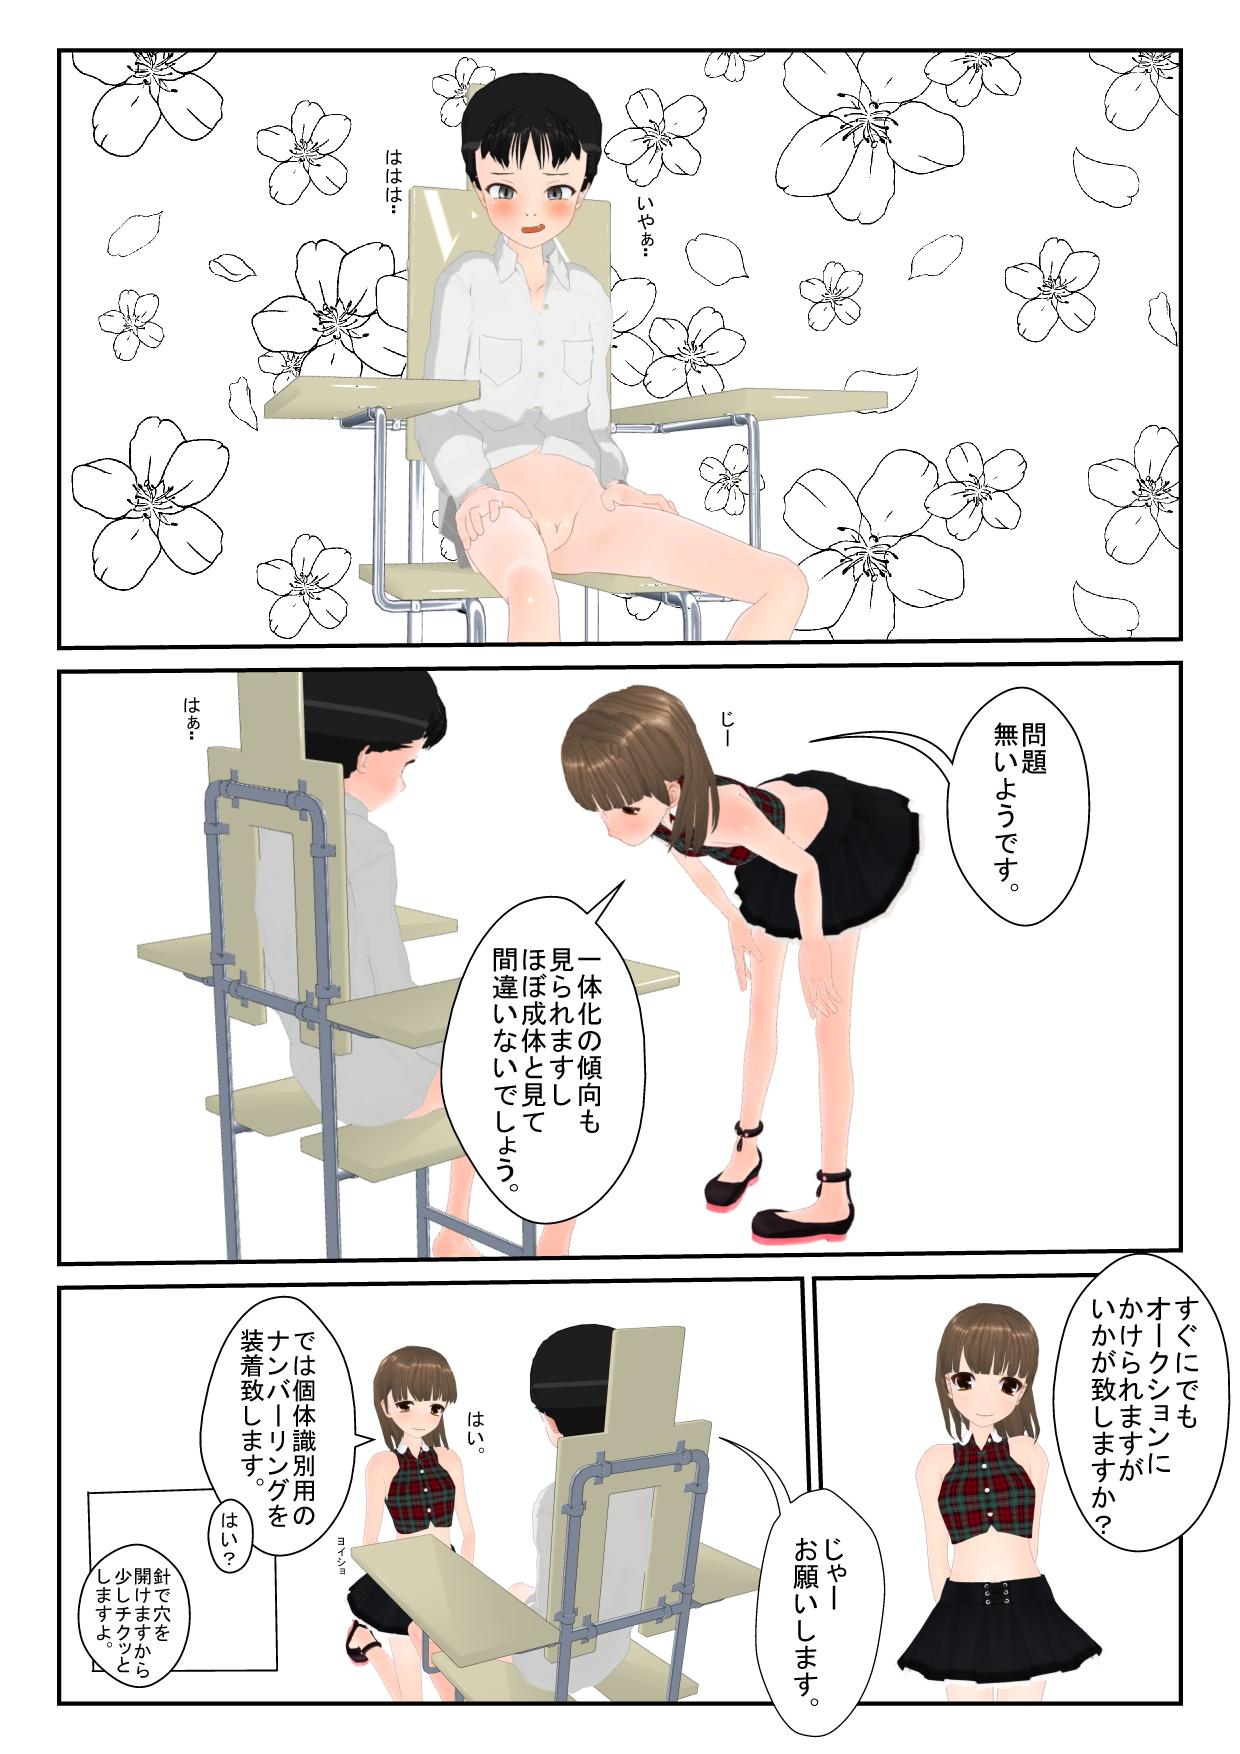 hirakuri0006.jpg